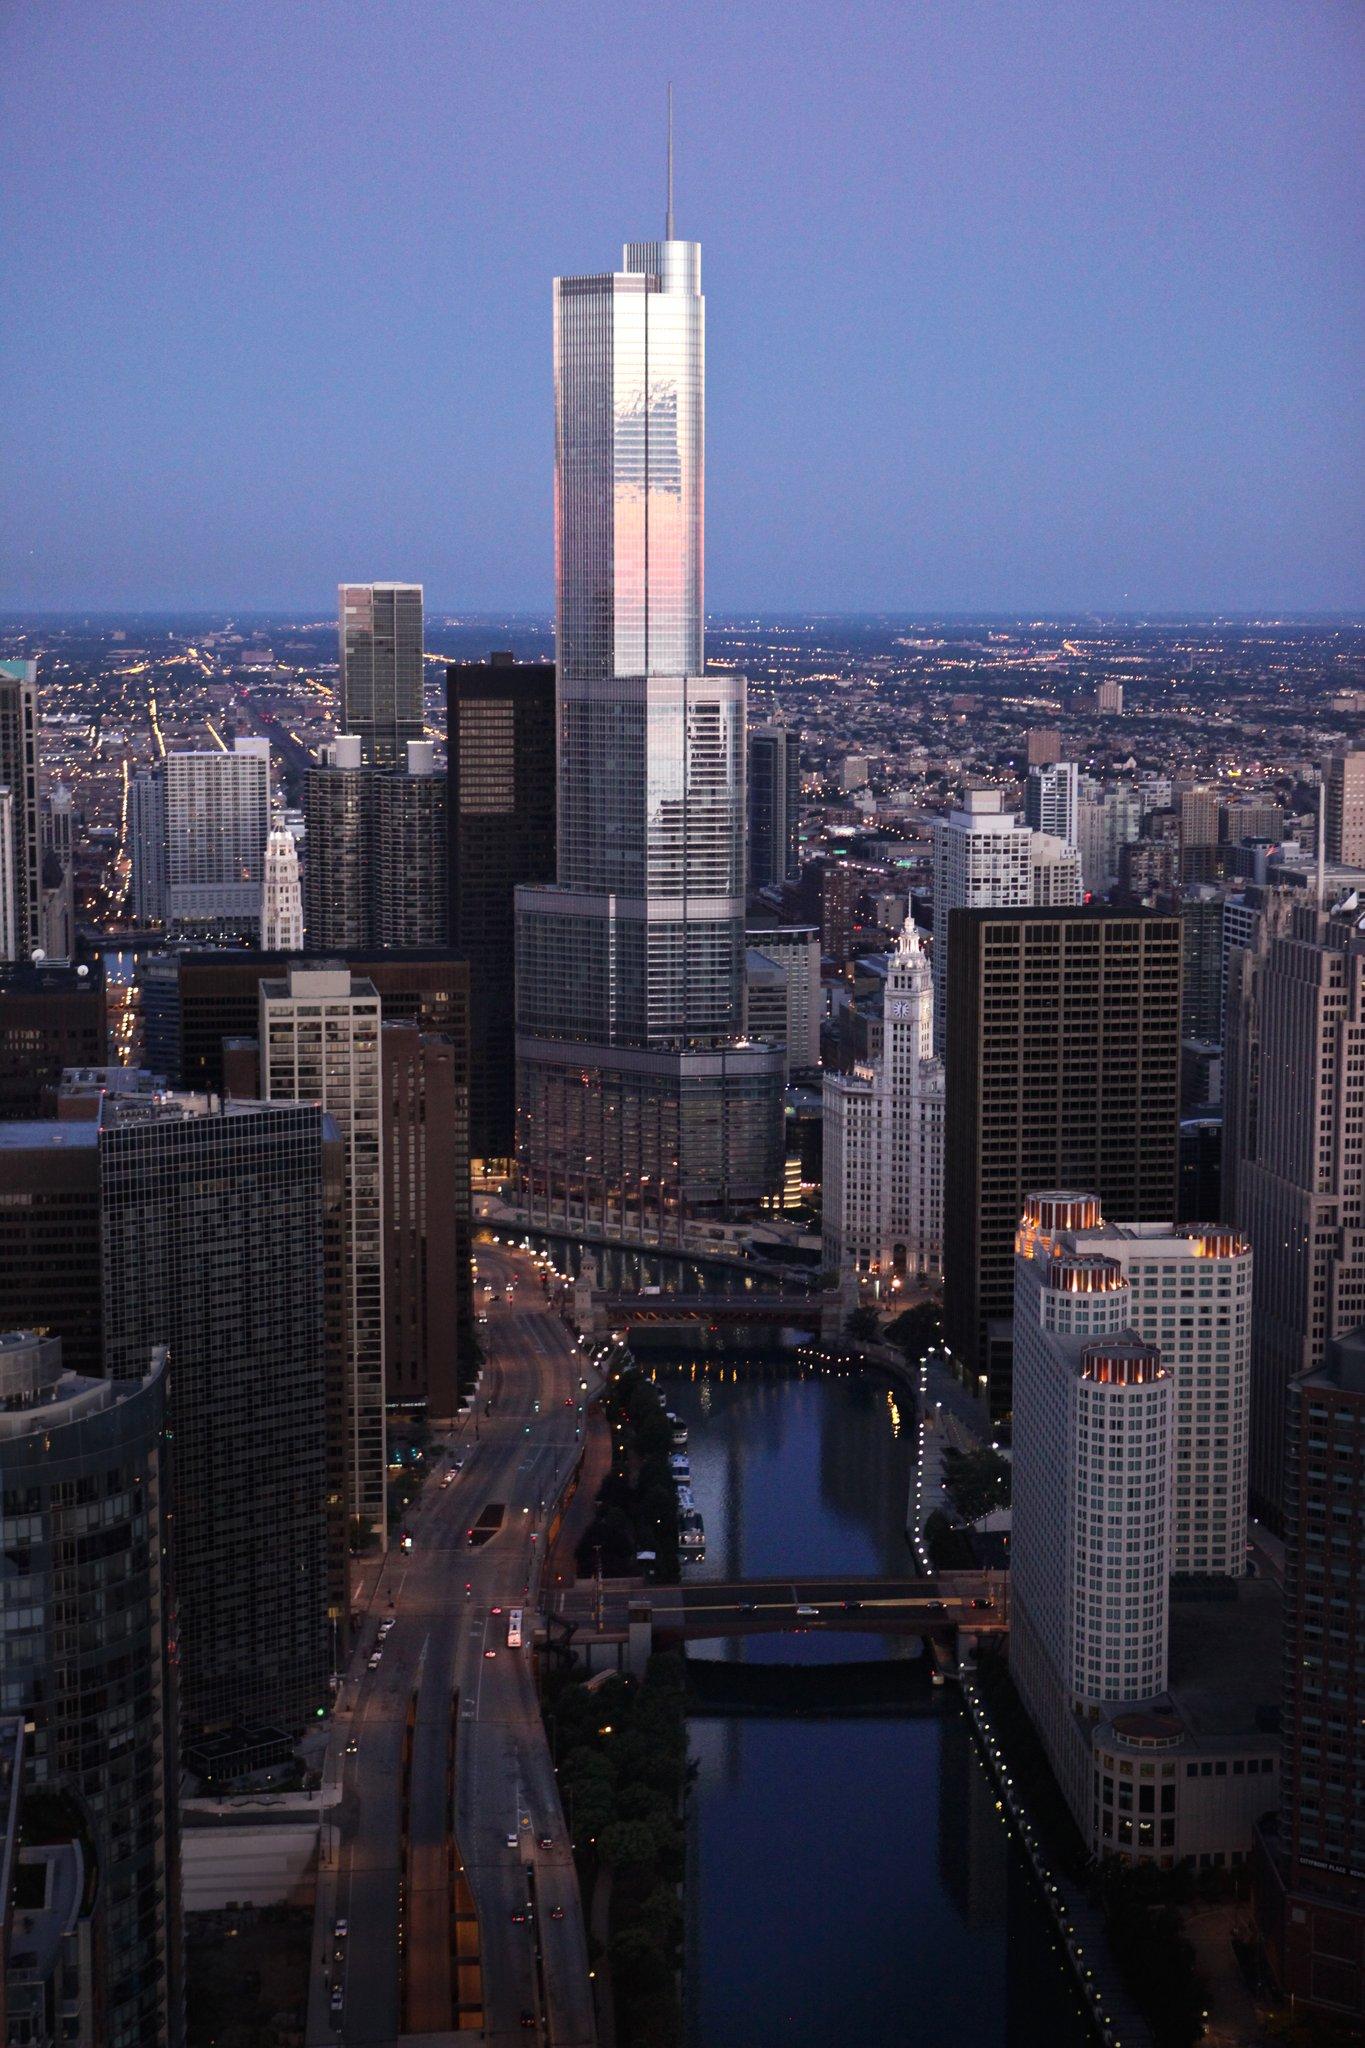 Trump International Hotel/Tower Chicago